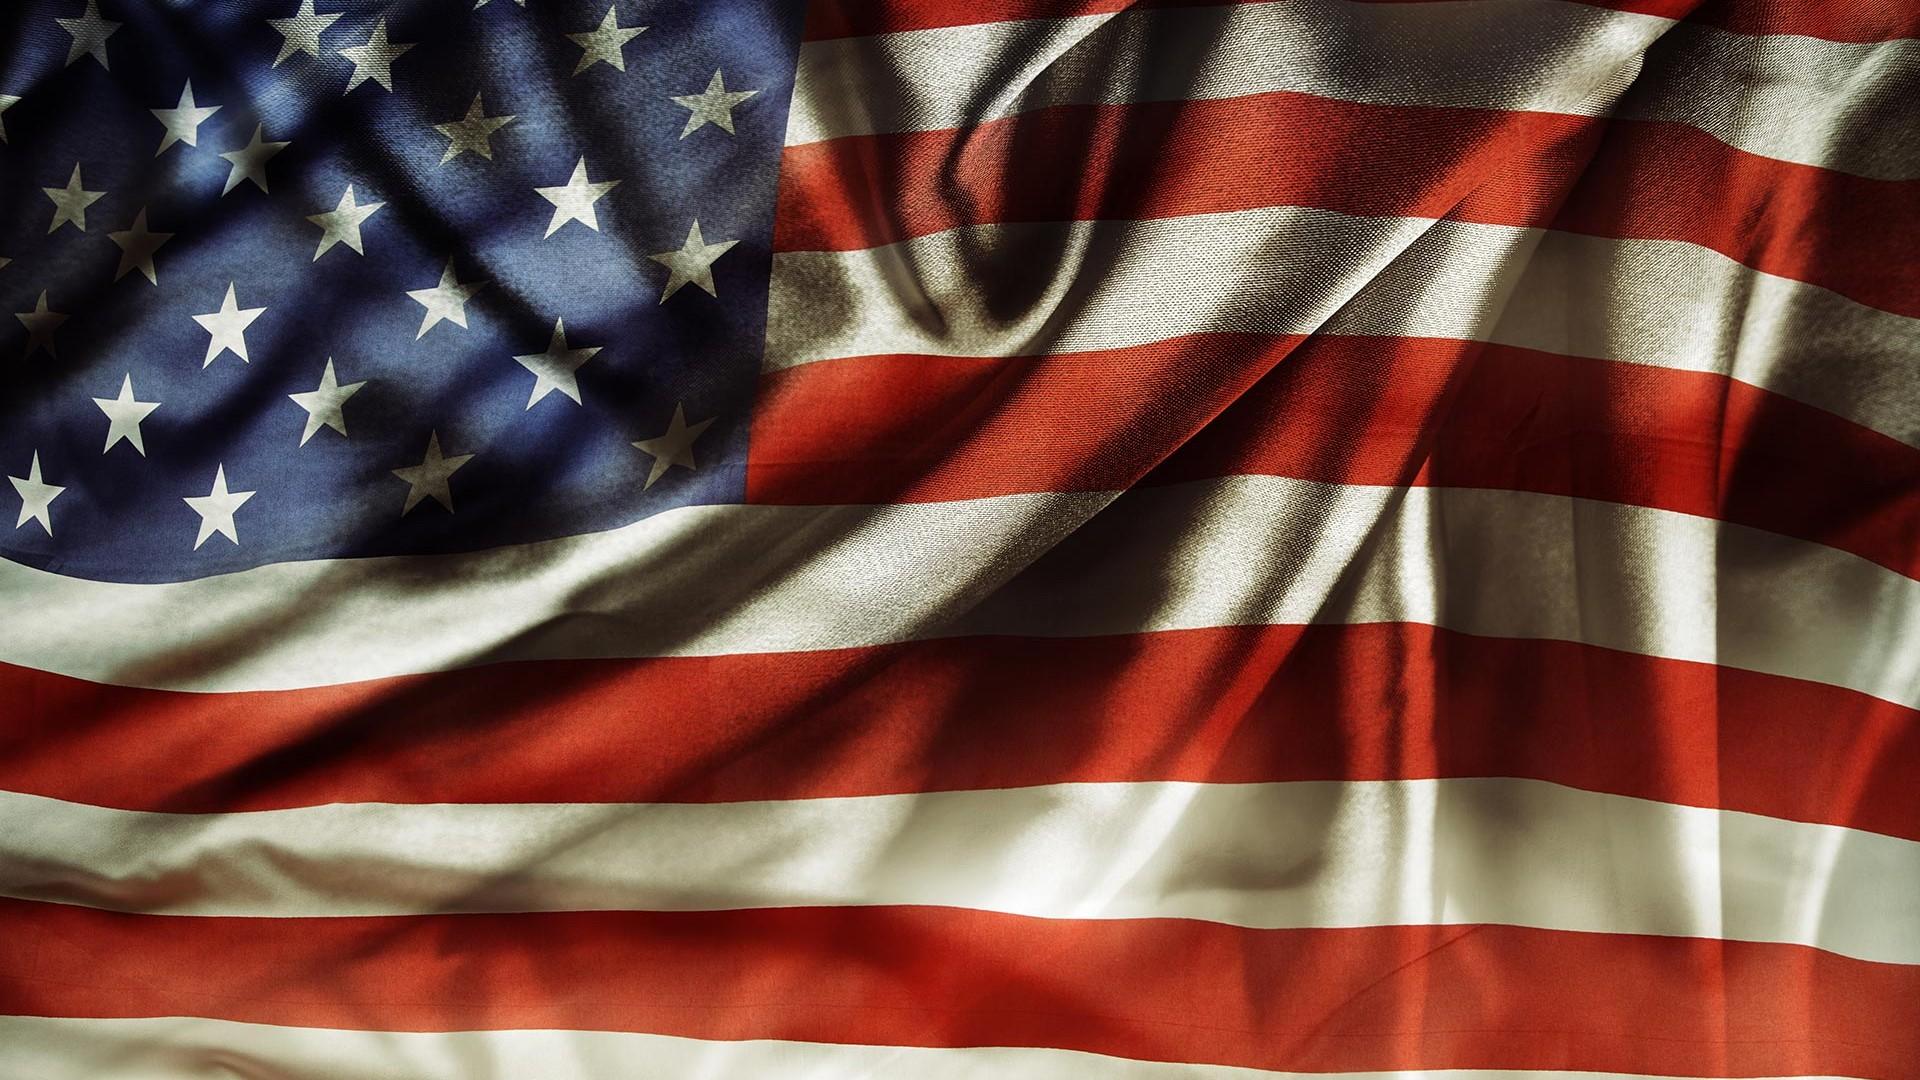 100+ American Flag wallpaper Images for nation lover ...